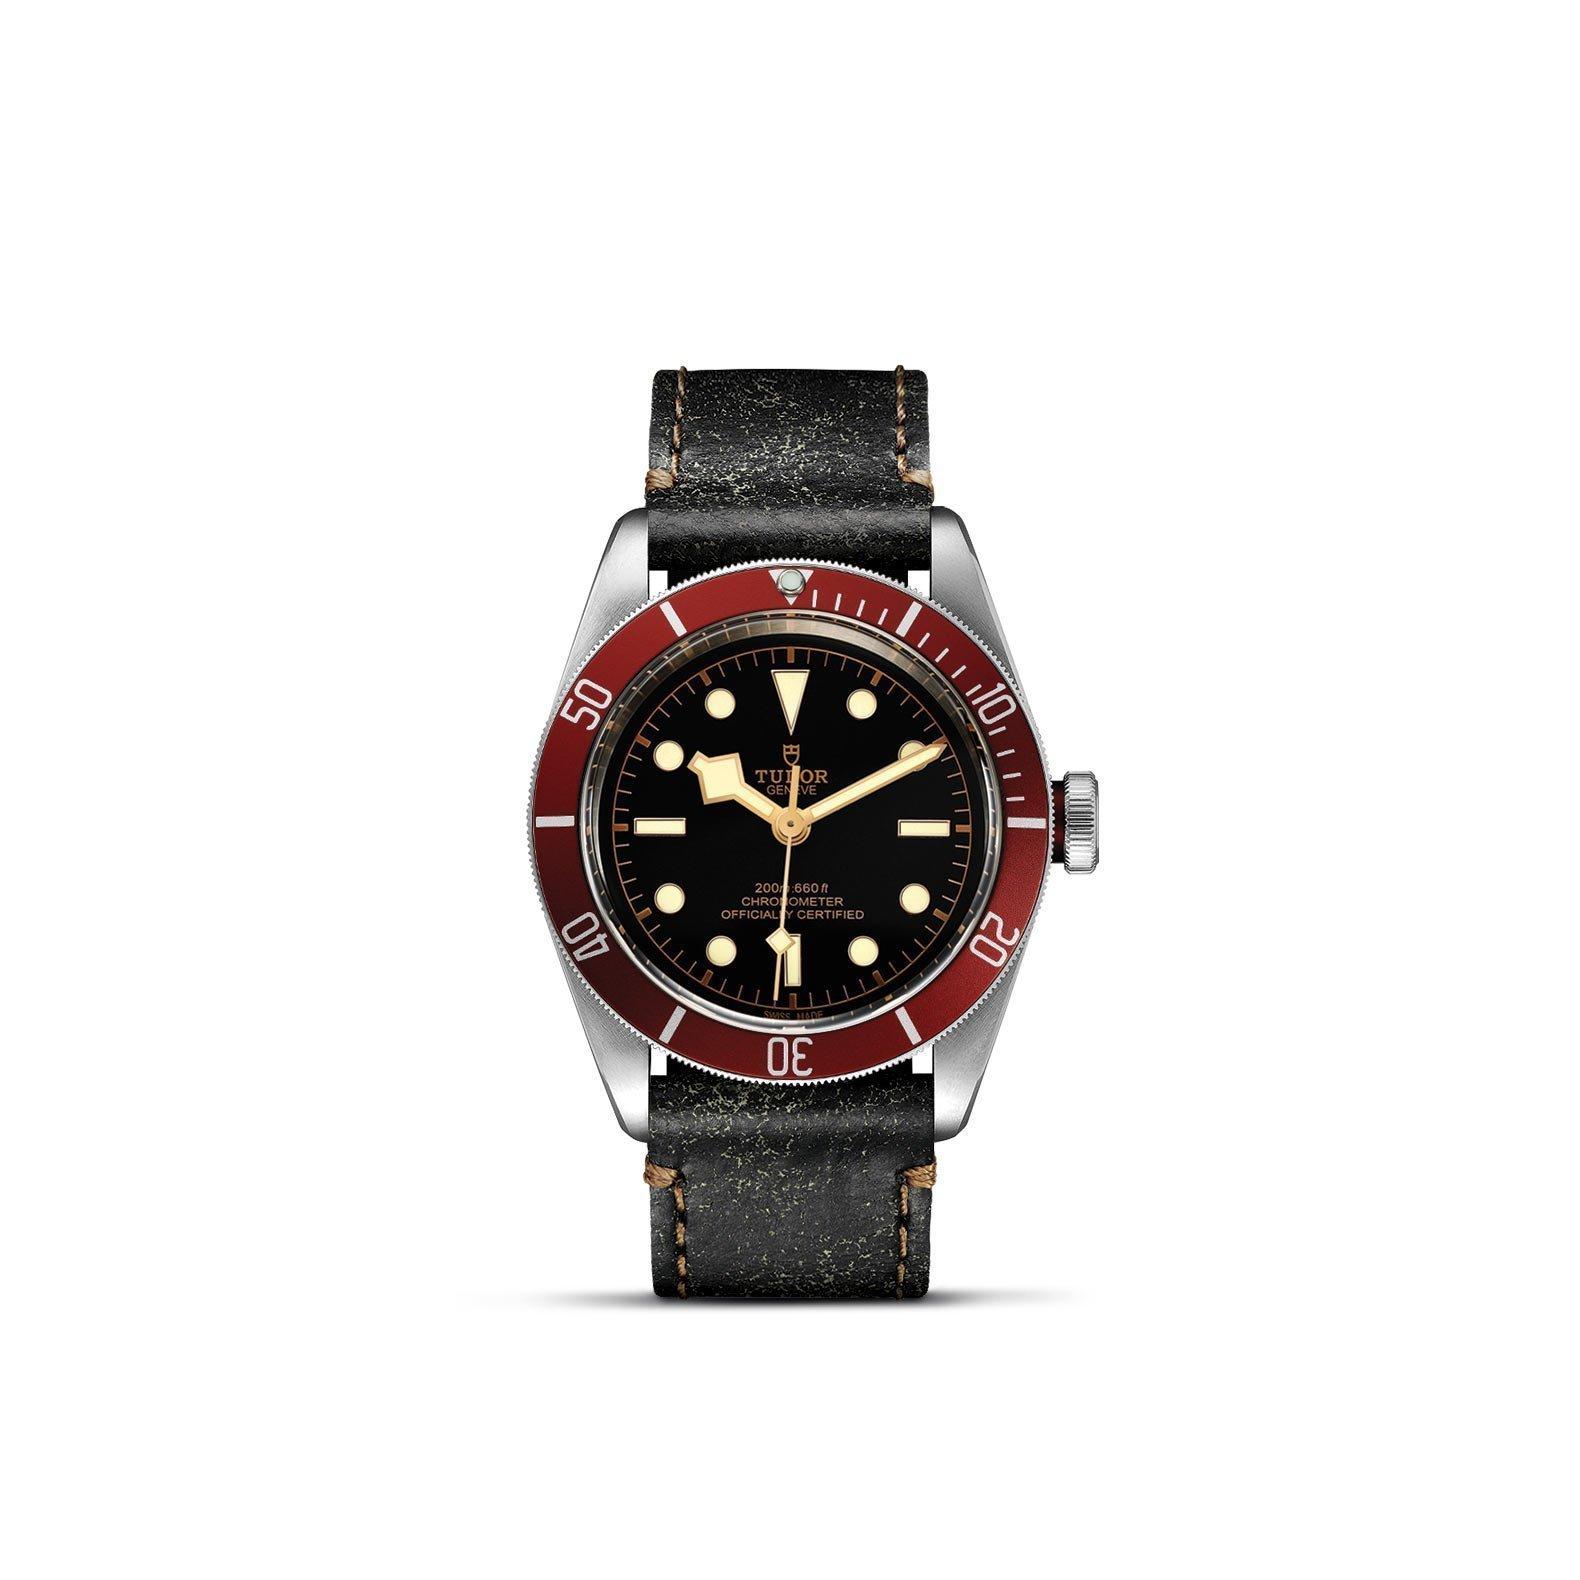 Montre TUDOR Black Bay boîtier en acier, 41mm, bracelet en cuir vieilli vue 1